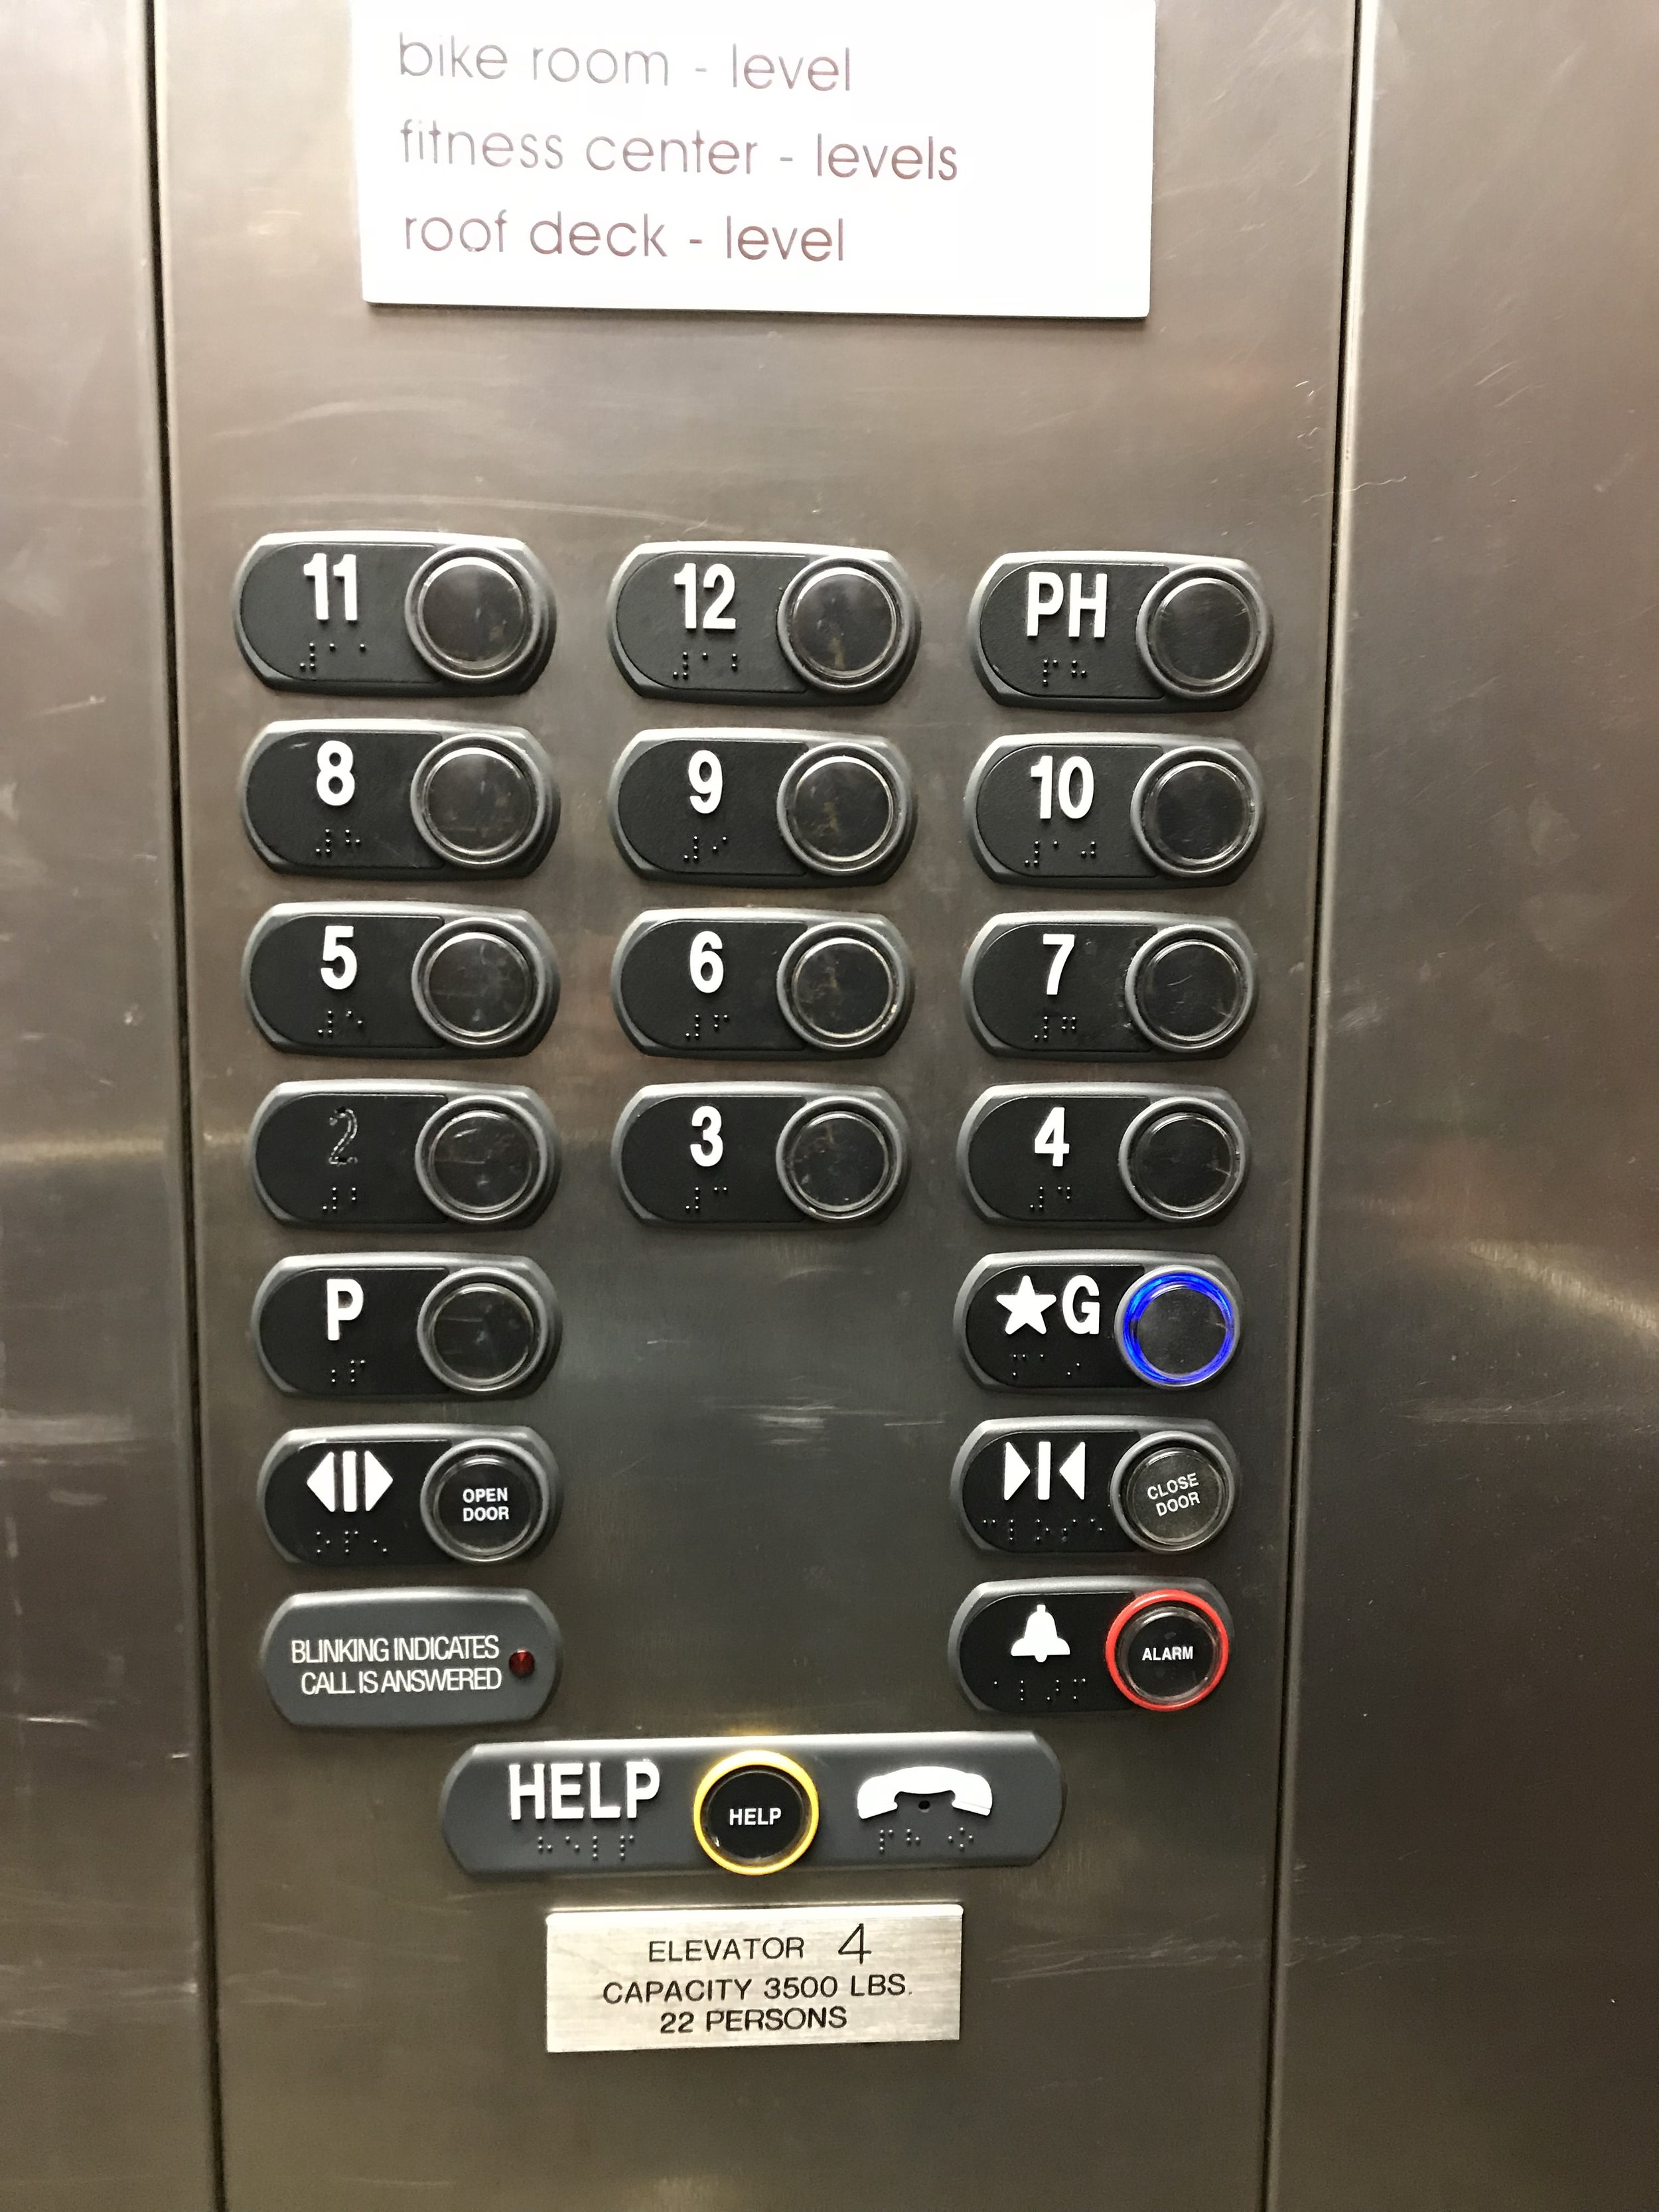 Image 8. Elevator 4